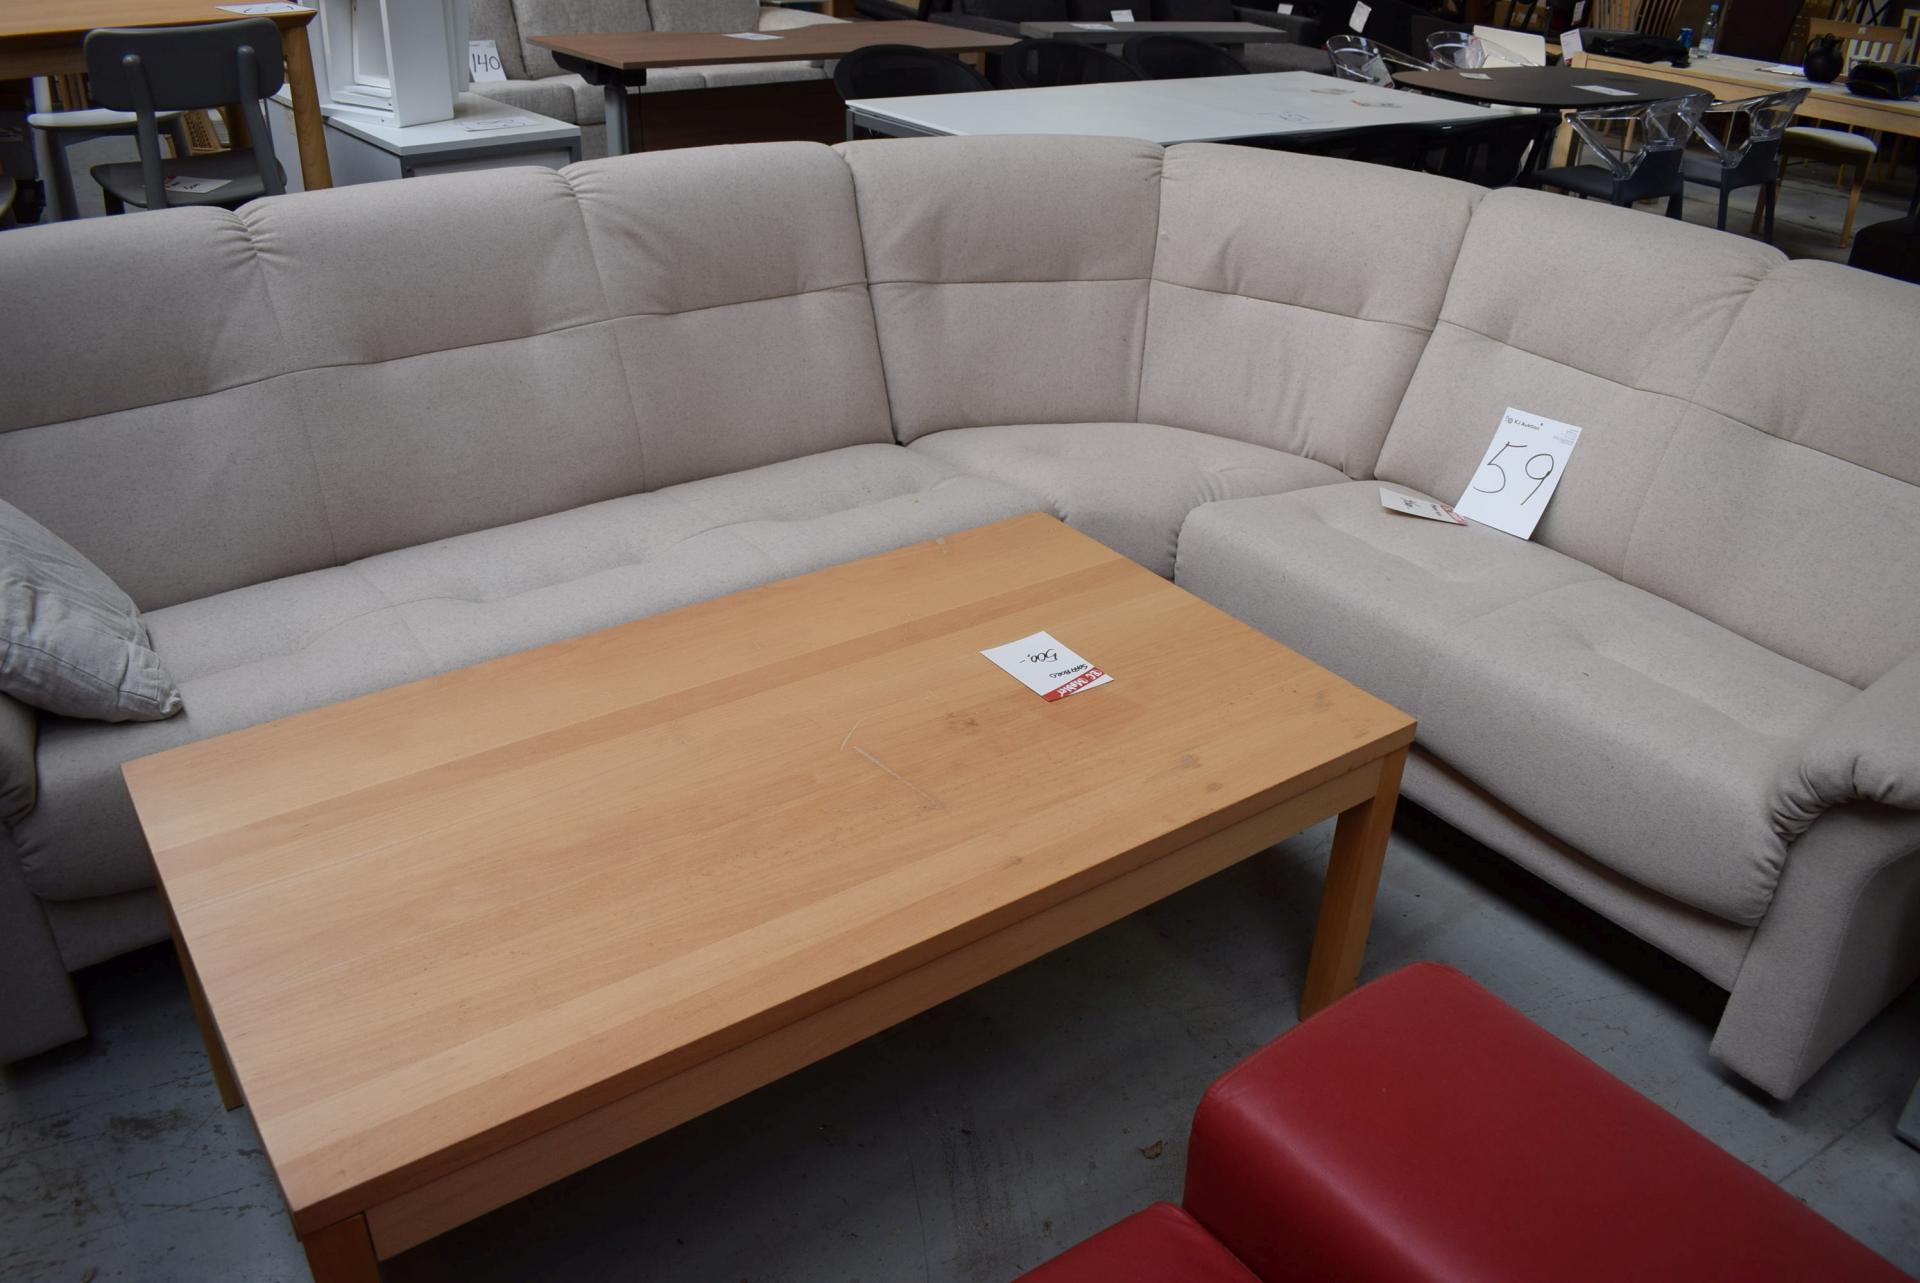 6 Pers Corner Sofa Coffee Table 75 X 135 Cm